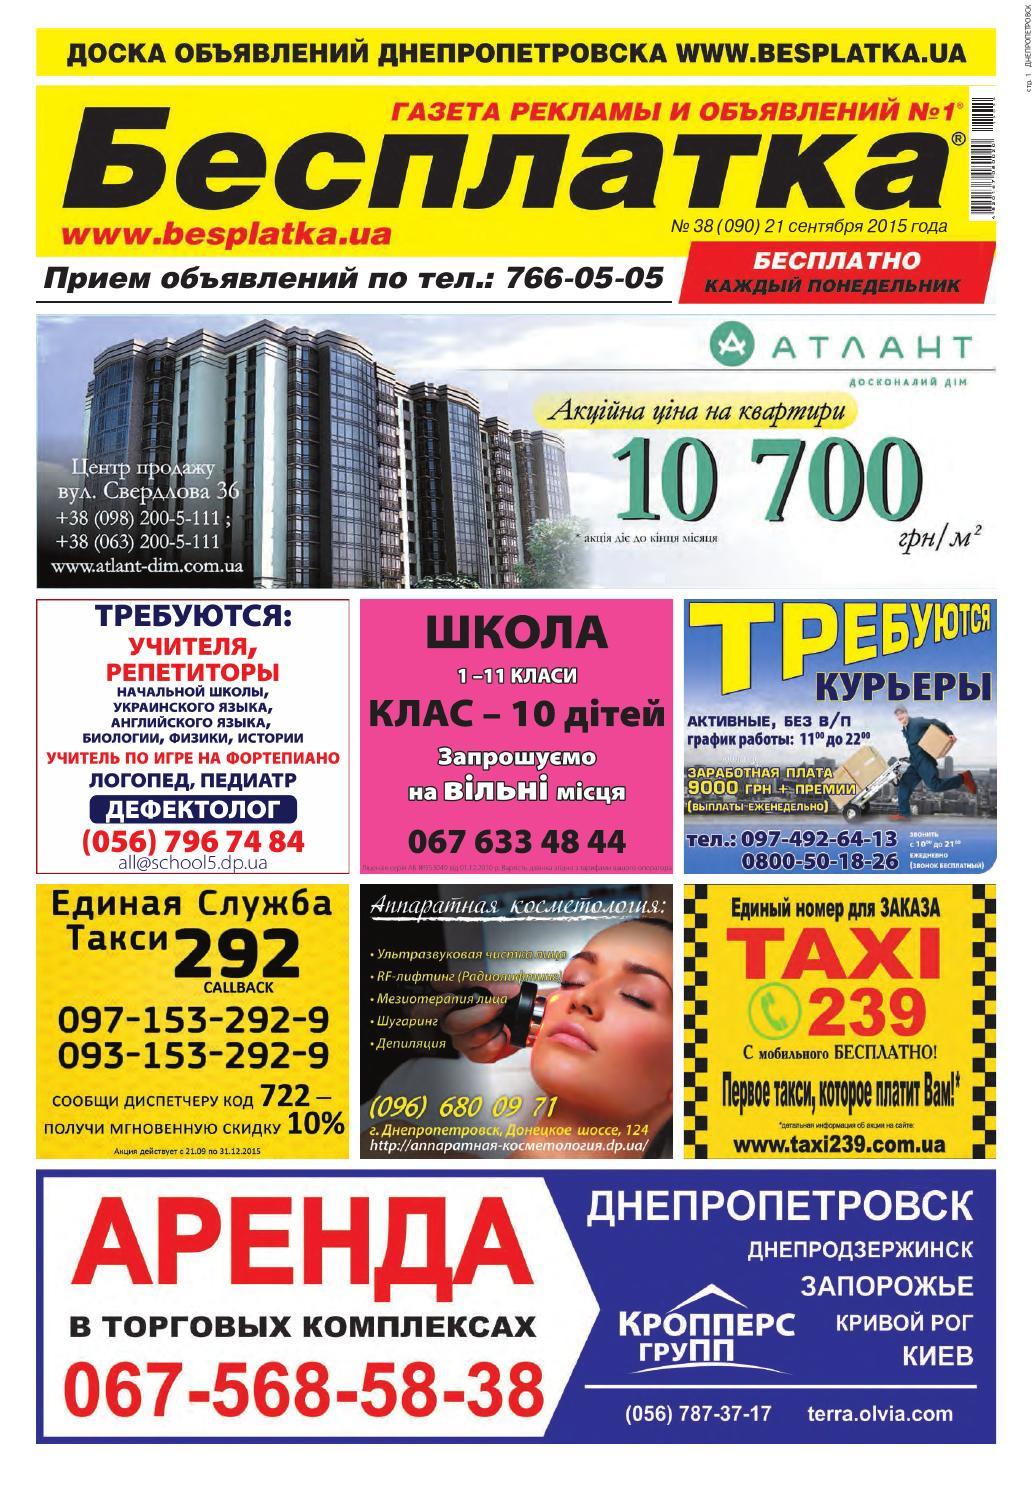 e02e1647d Besplatka #38 Днепропетровск by besplatka ukraine - issuu